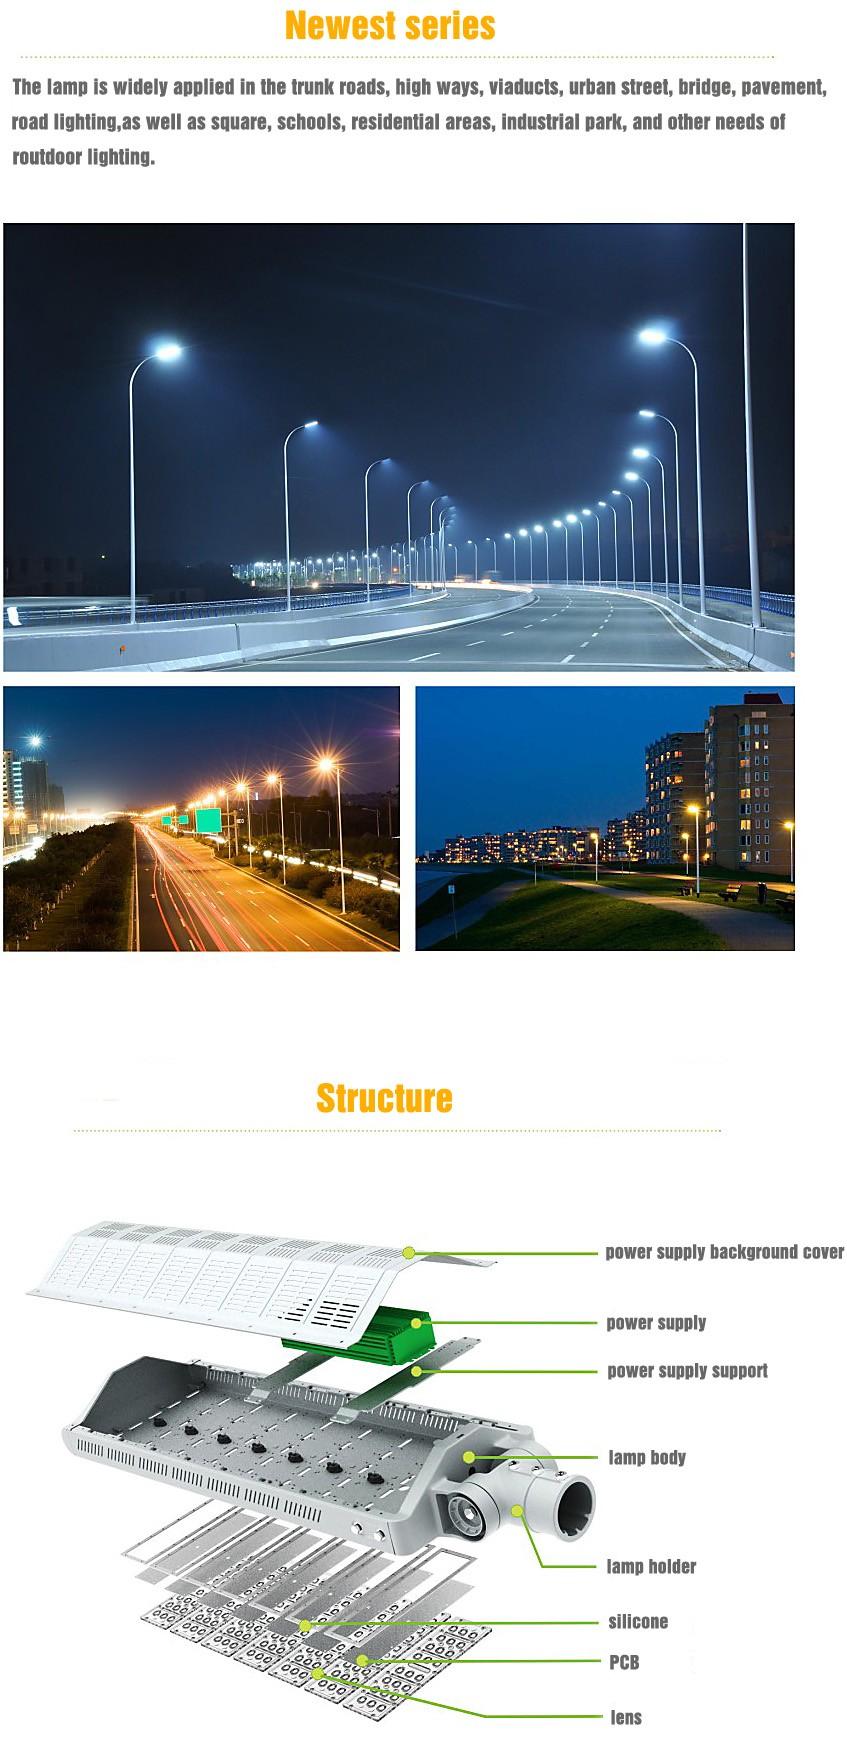 100watt led parking lot light retrofit 400w street pole. Black Bedroom Furniture Sets. Home Design Ideas